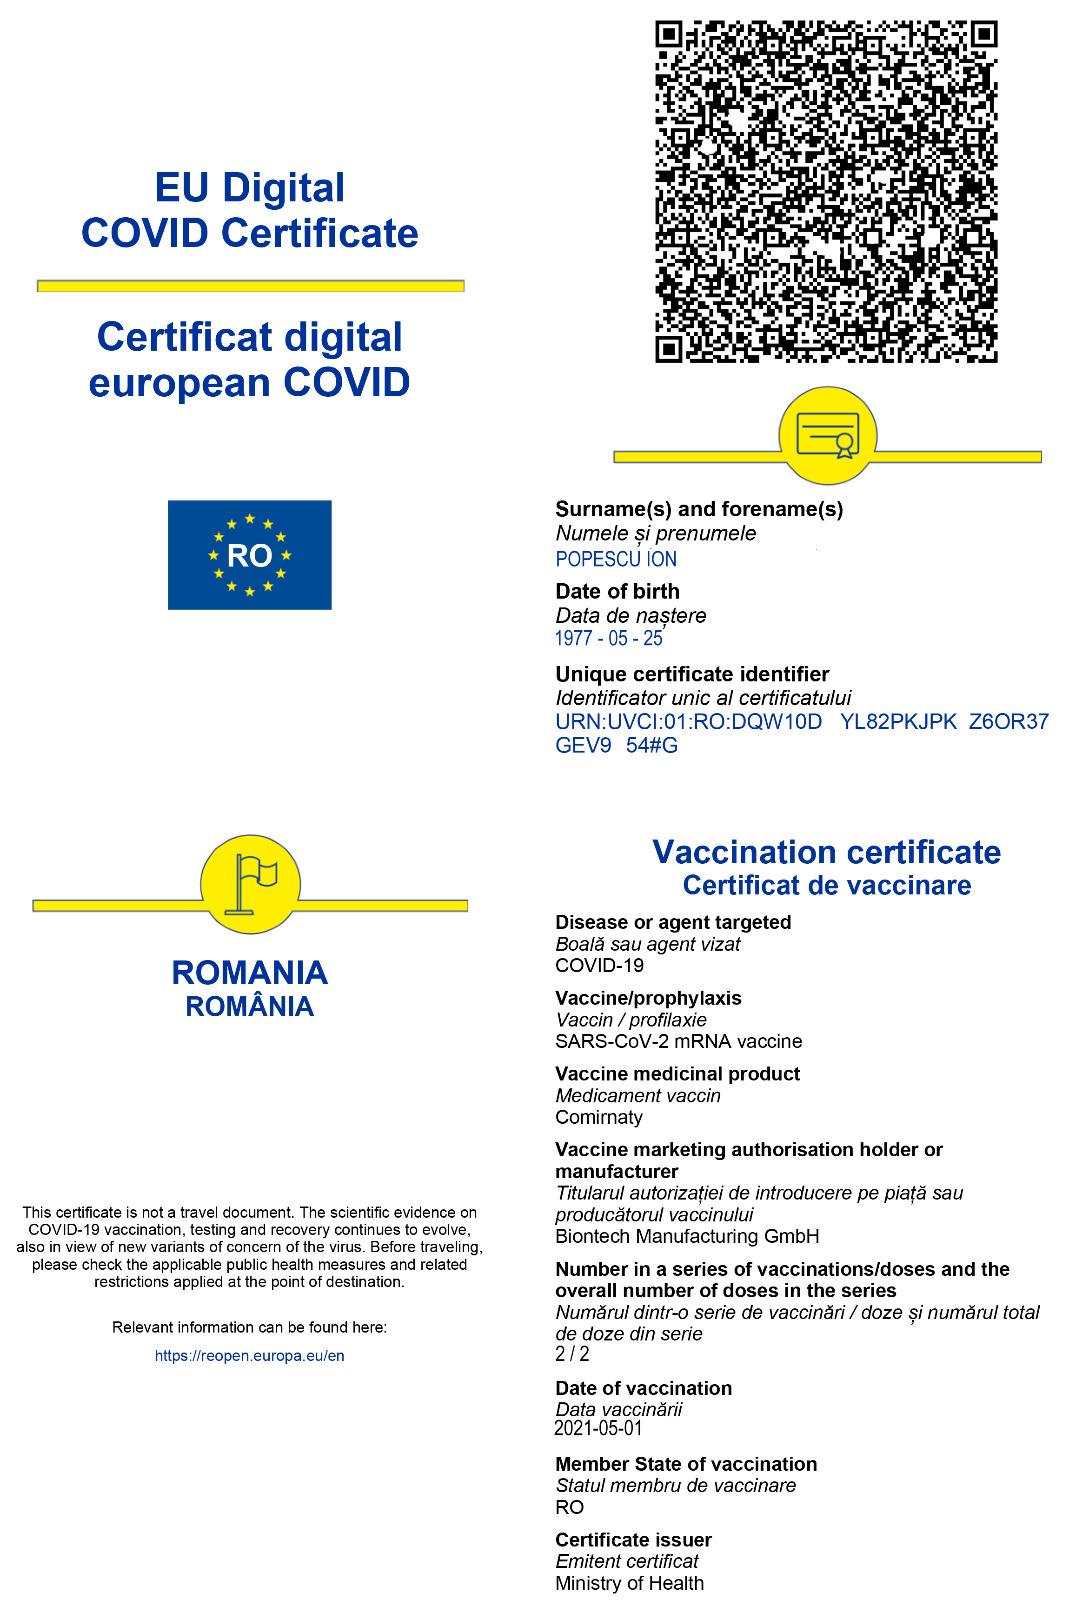 certificat digital covid mare